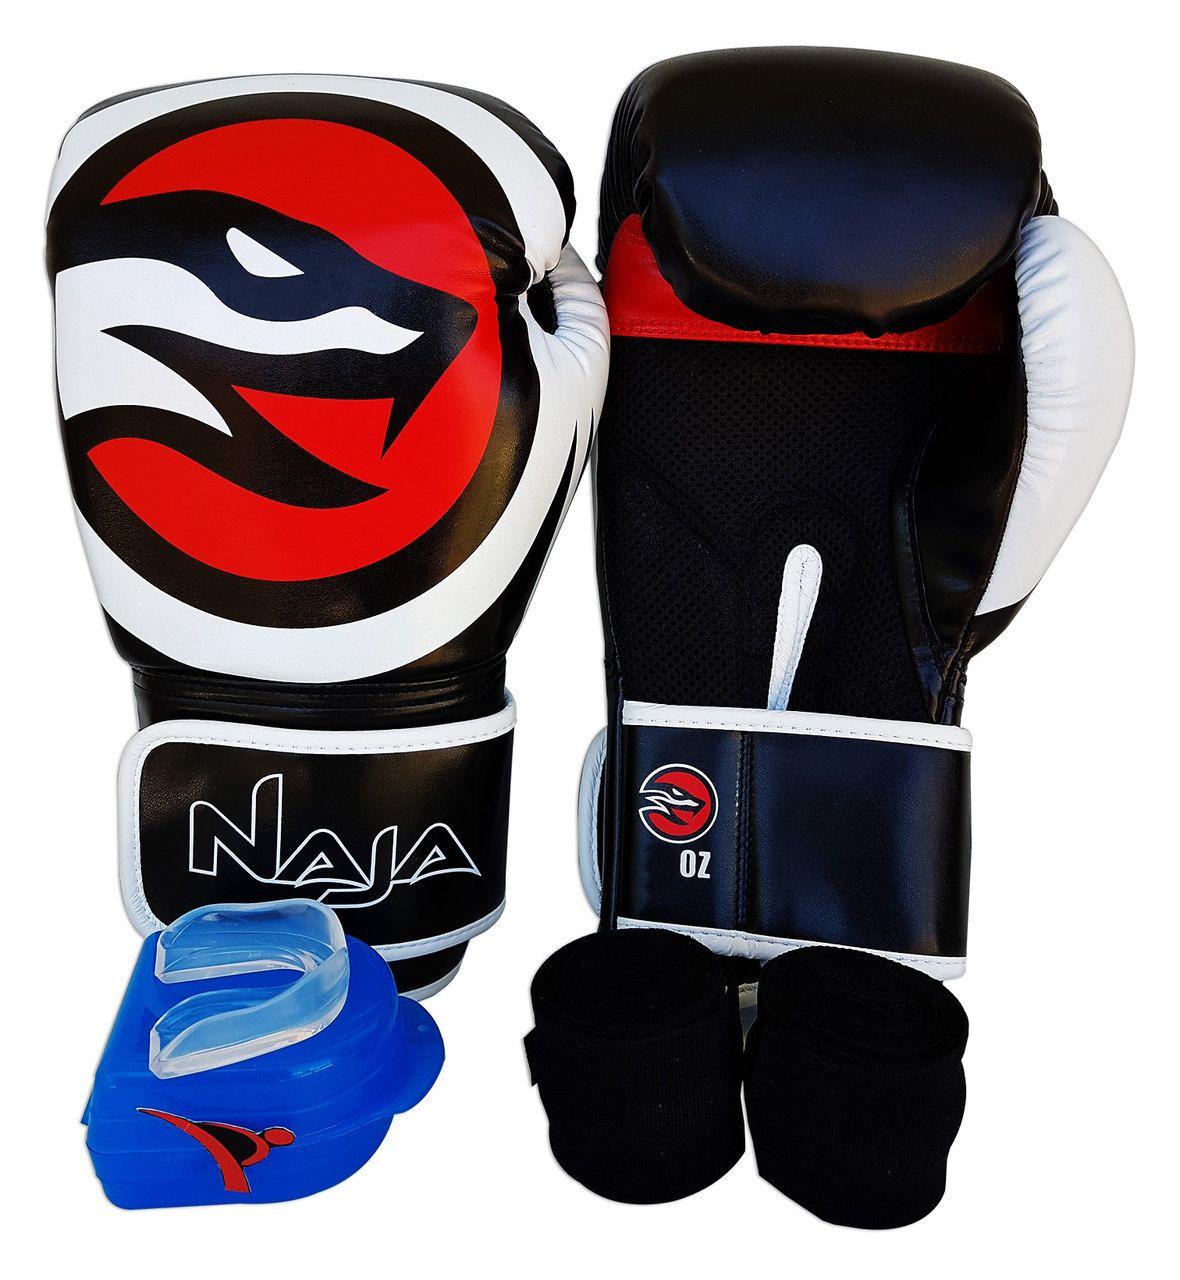 Kit De Boxe / Muay Thai 12oz - Preto - OPP - Naja  - PRALUTA SHOP